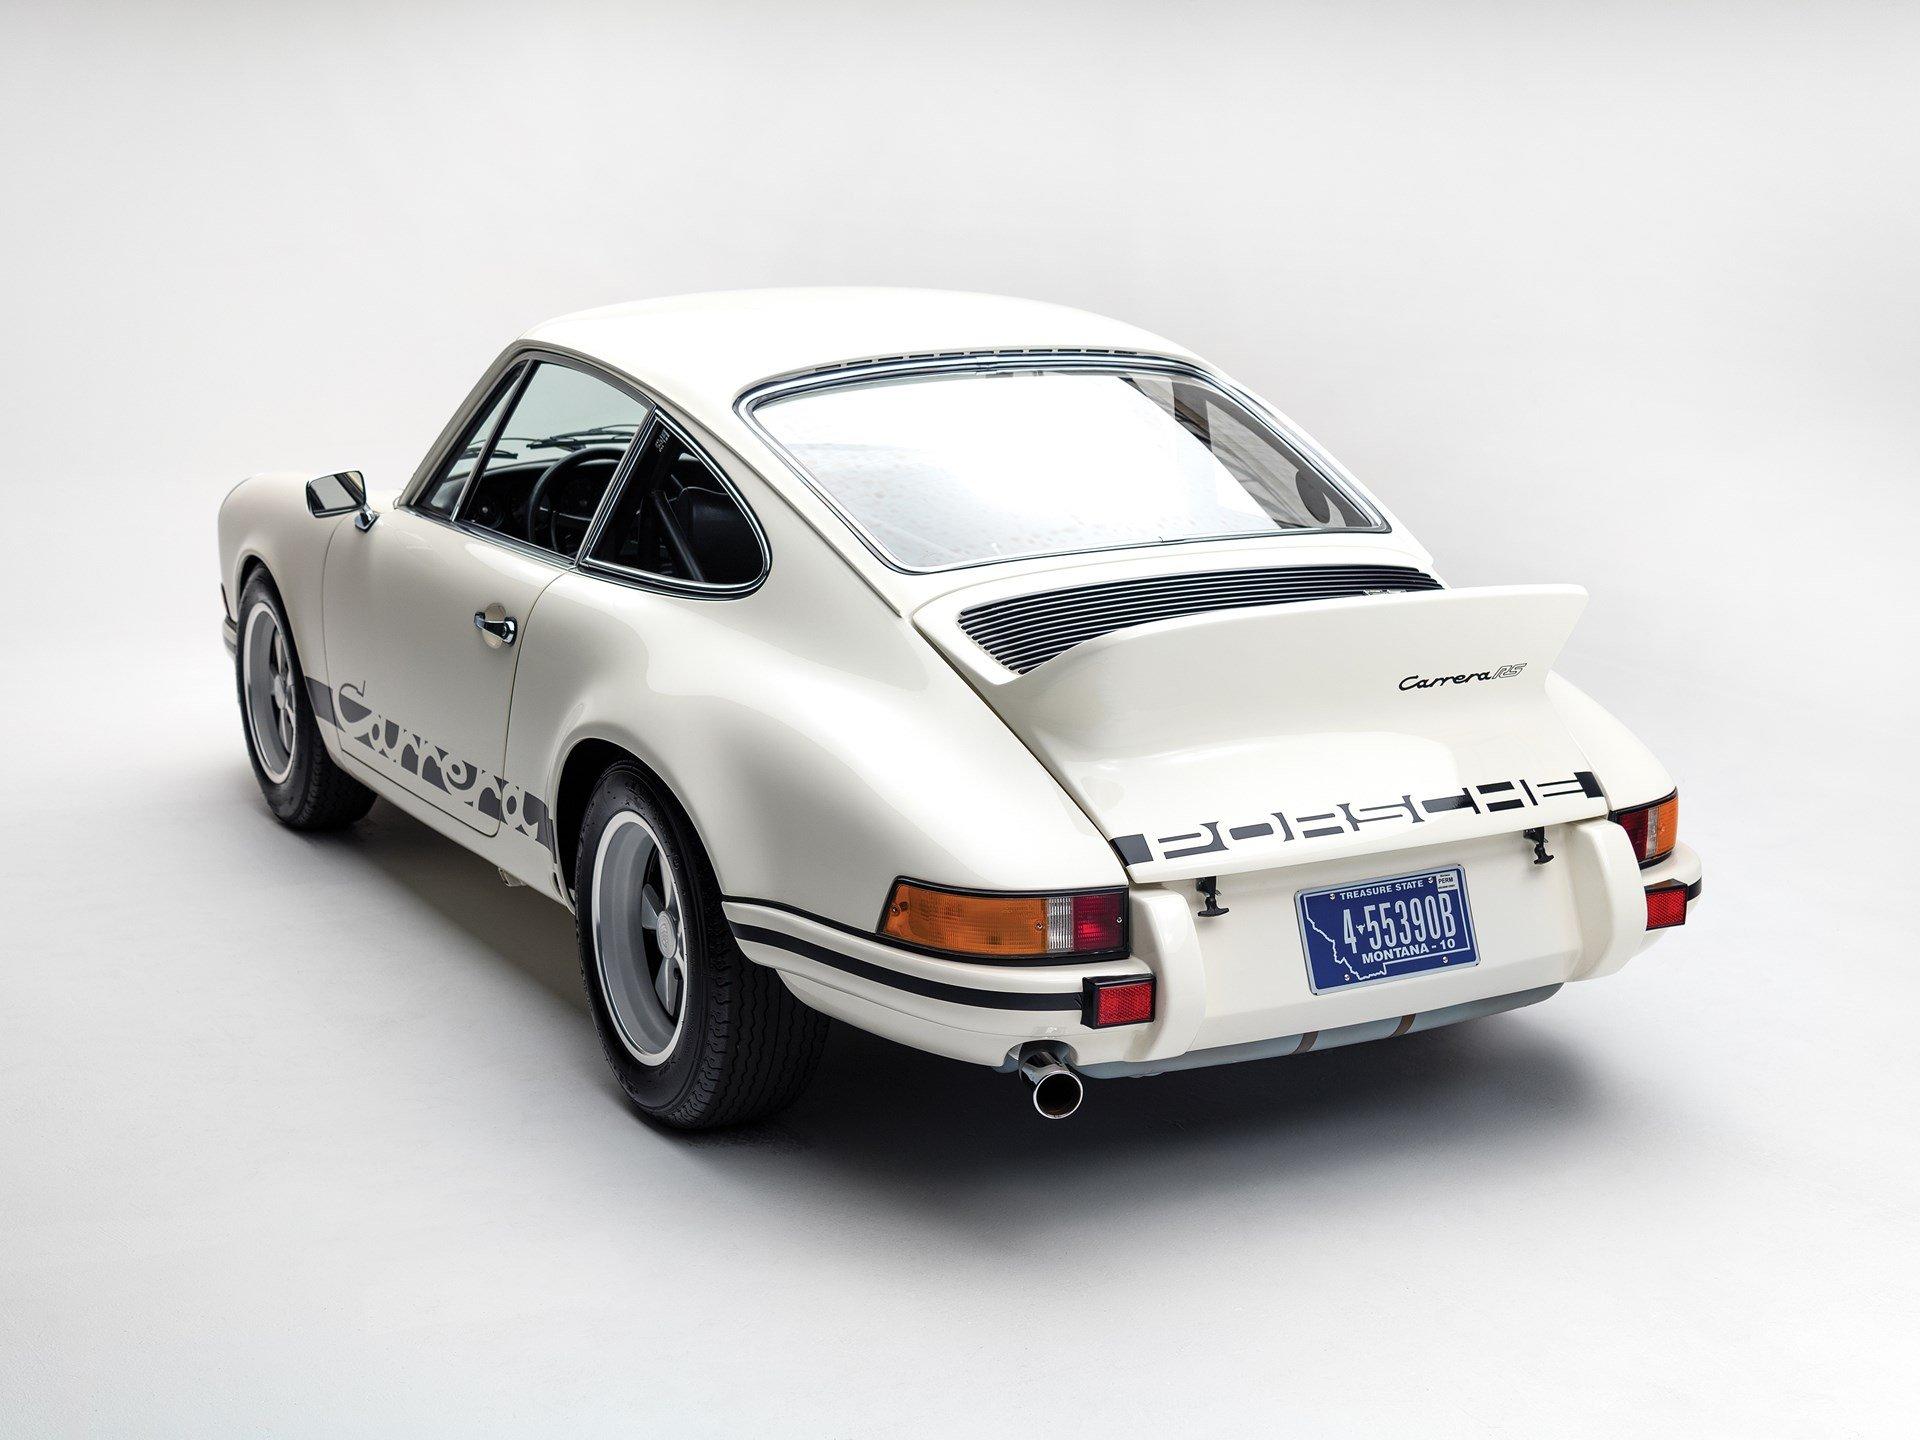 1973 Porsche 911 Carrera Rsh 2 7